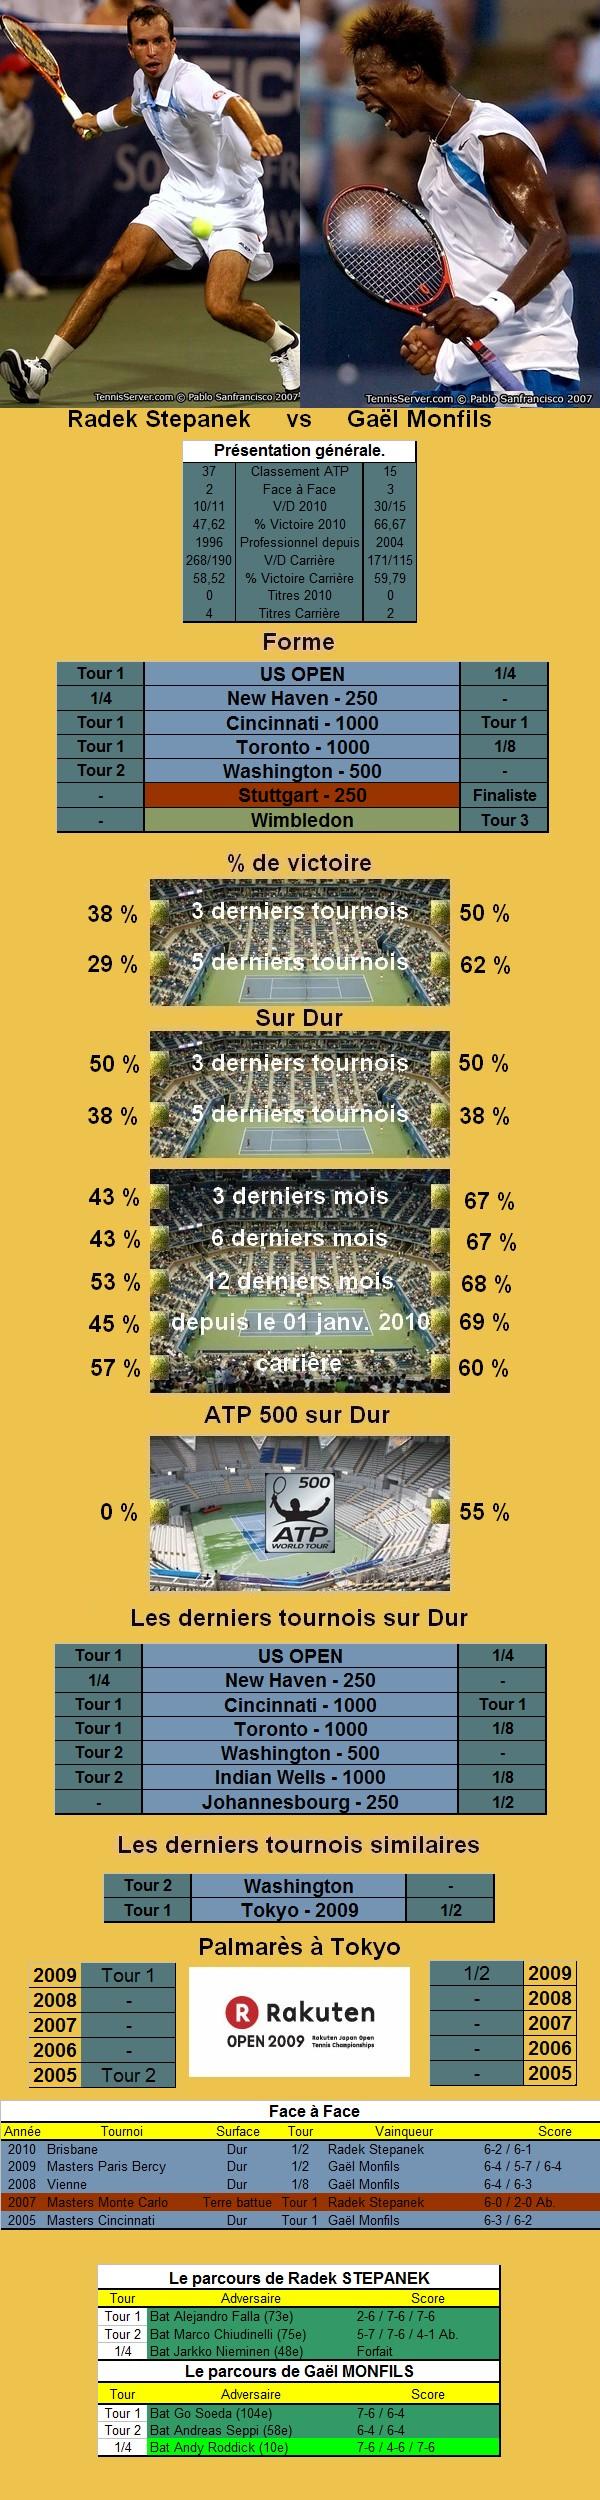 Statistiques tennis de Stepanek contre Monfils à Tokyo